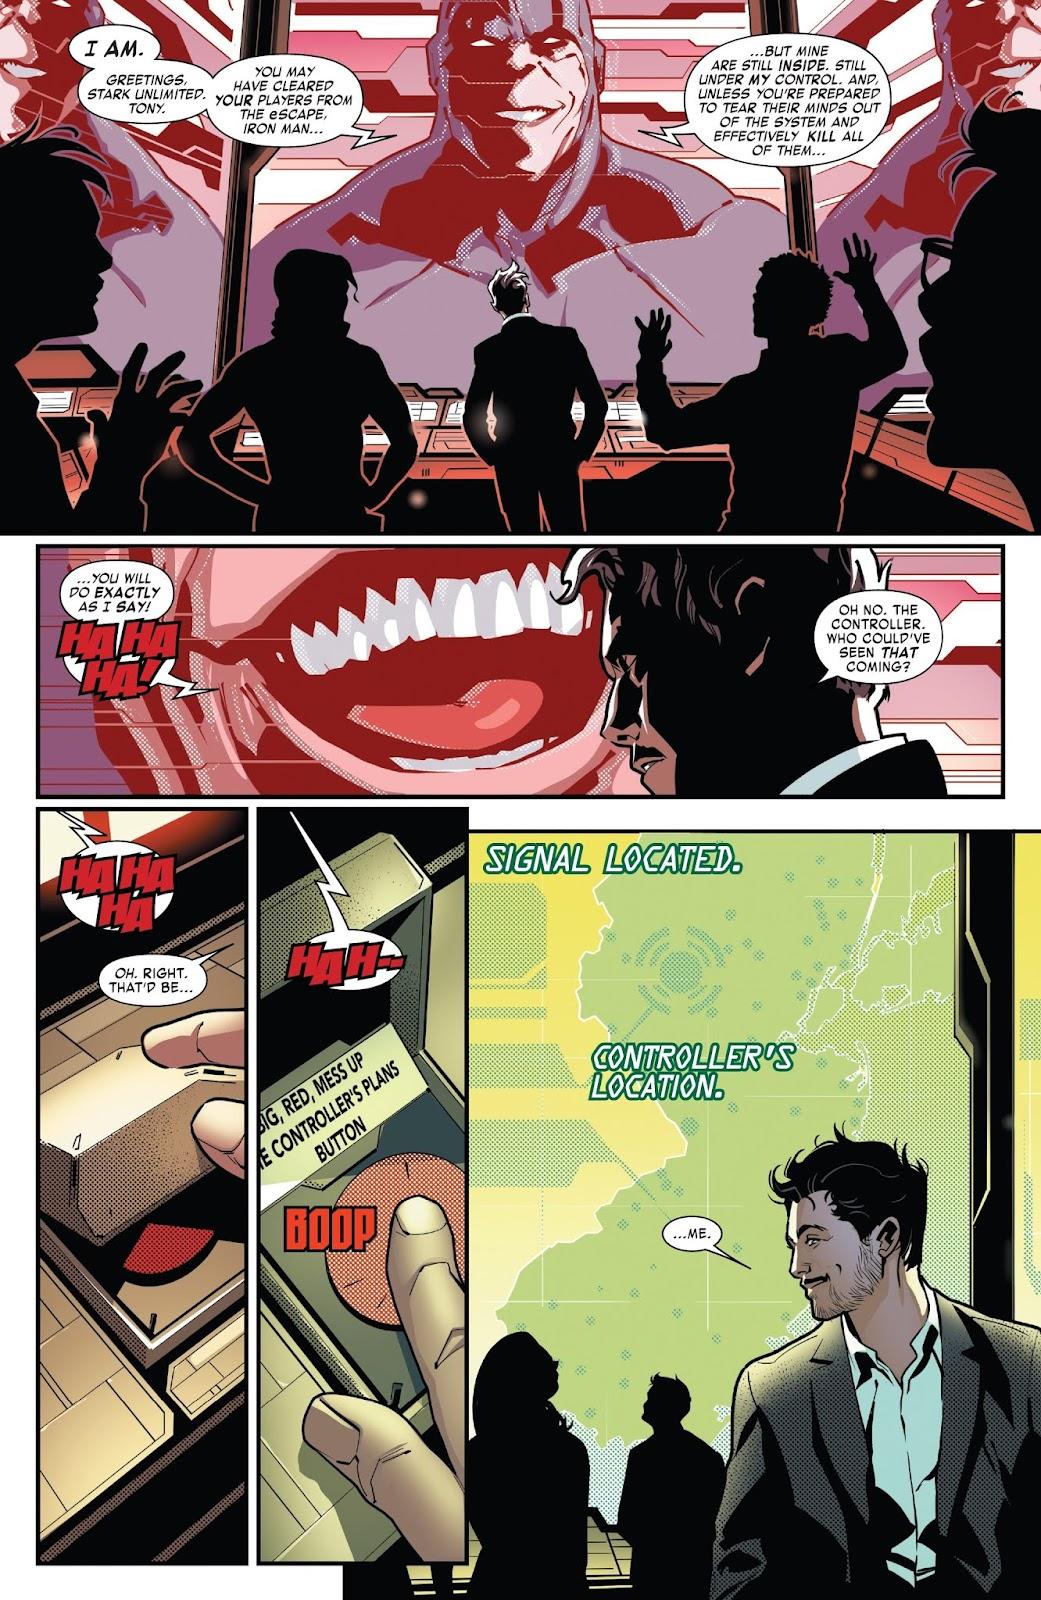 Read online Tony Stark: Iron Man comic -  Issue #7 - 13